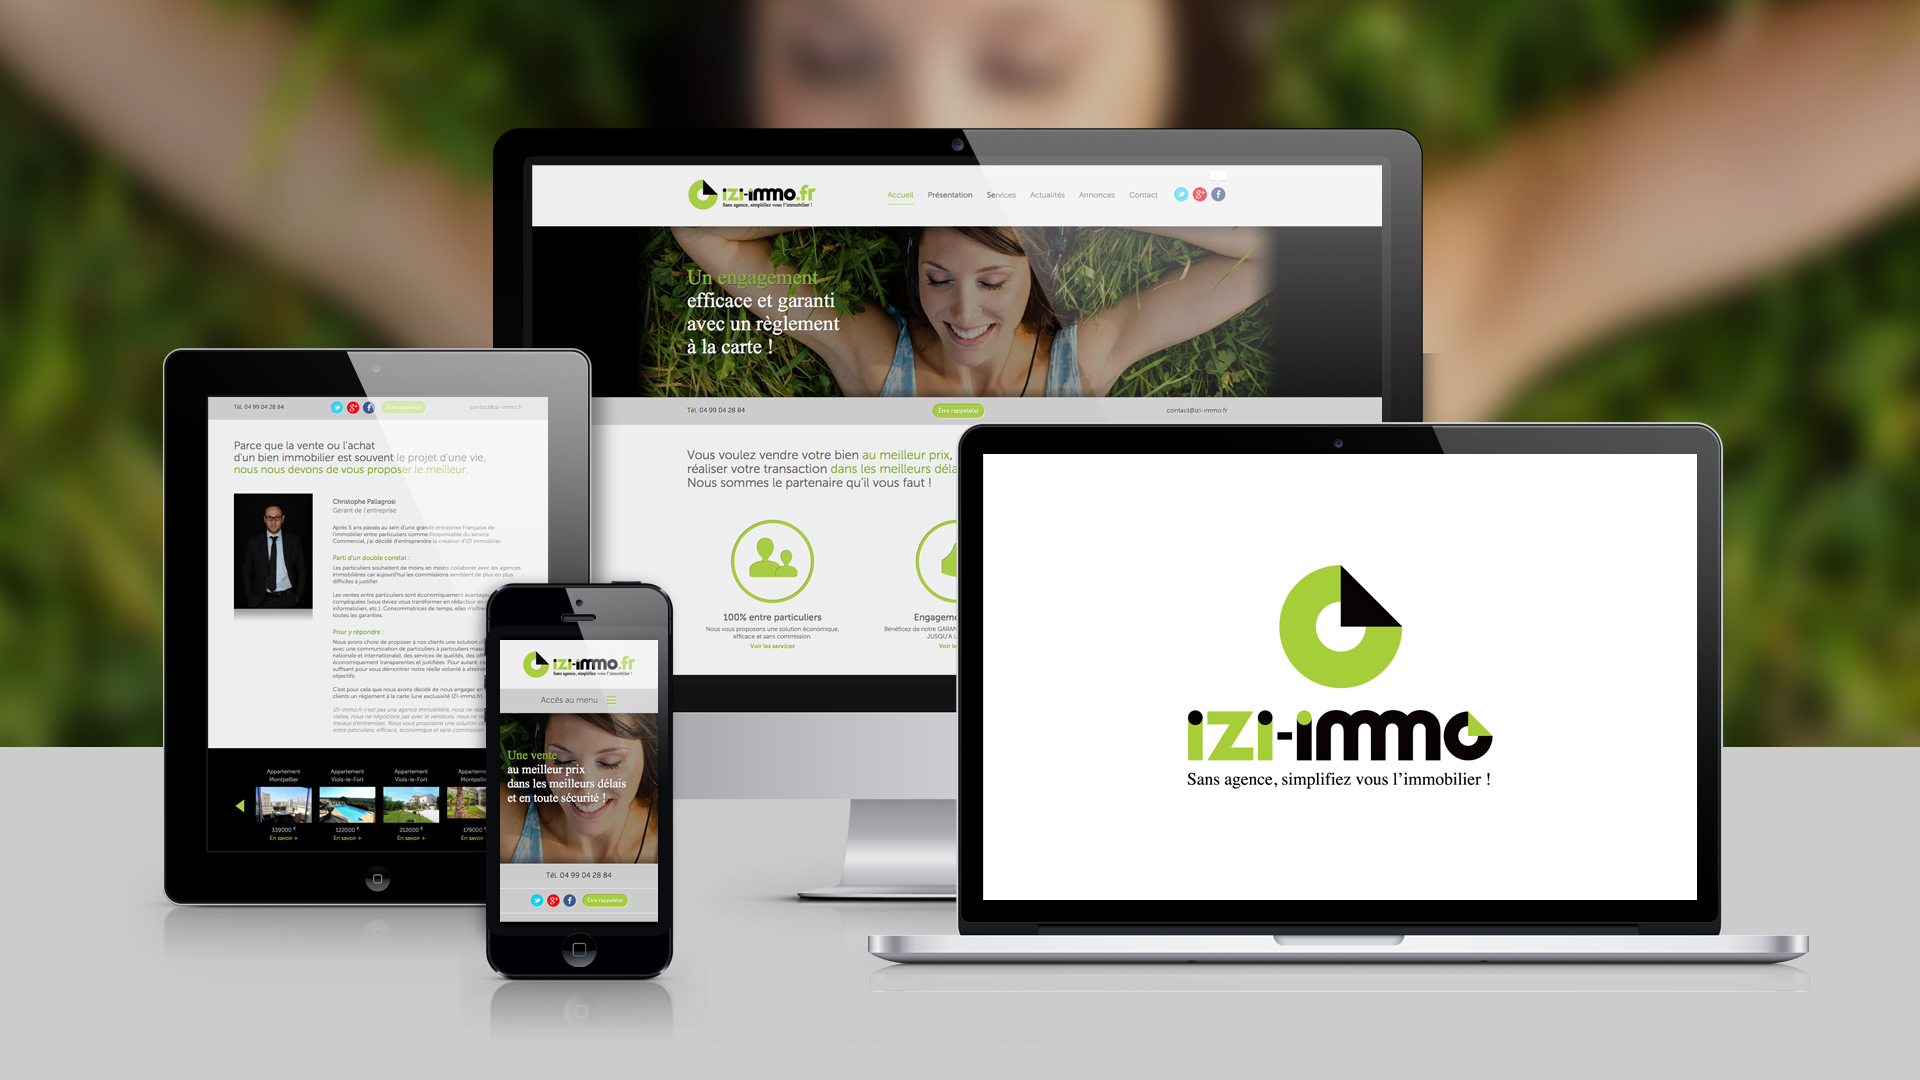 izi-immobilier-creation-site-internet-responsive-design-communication-caconcept-alexis-cretin-graphiste-montpellier